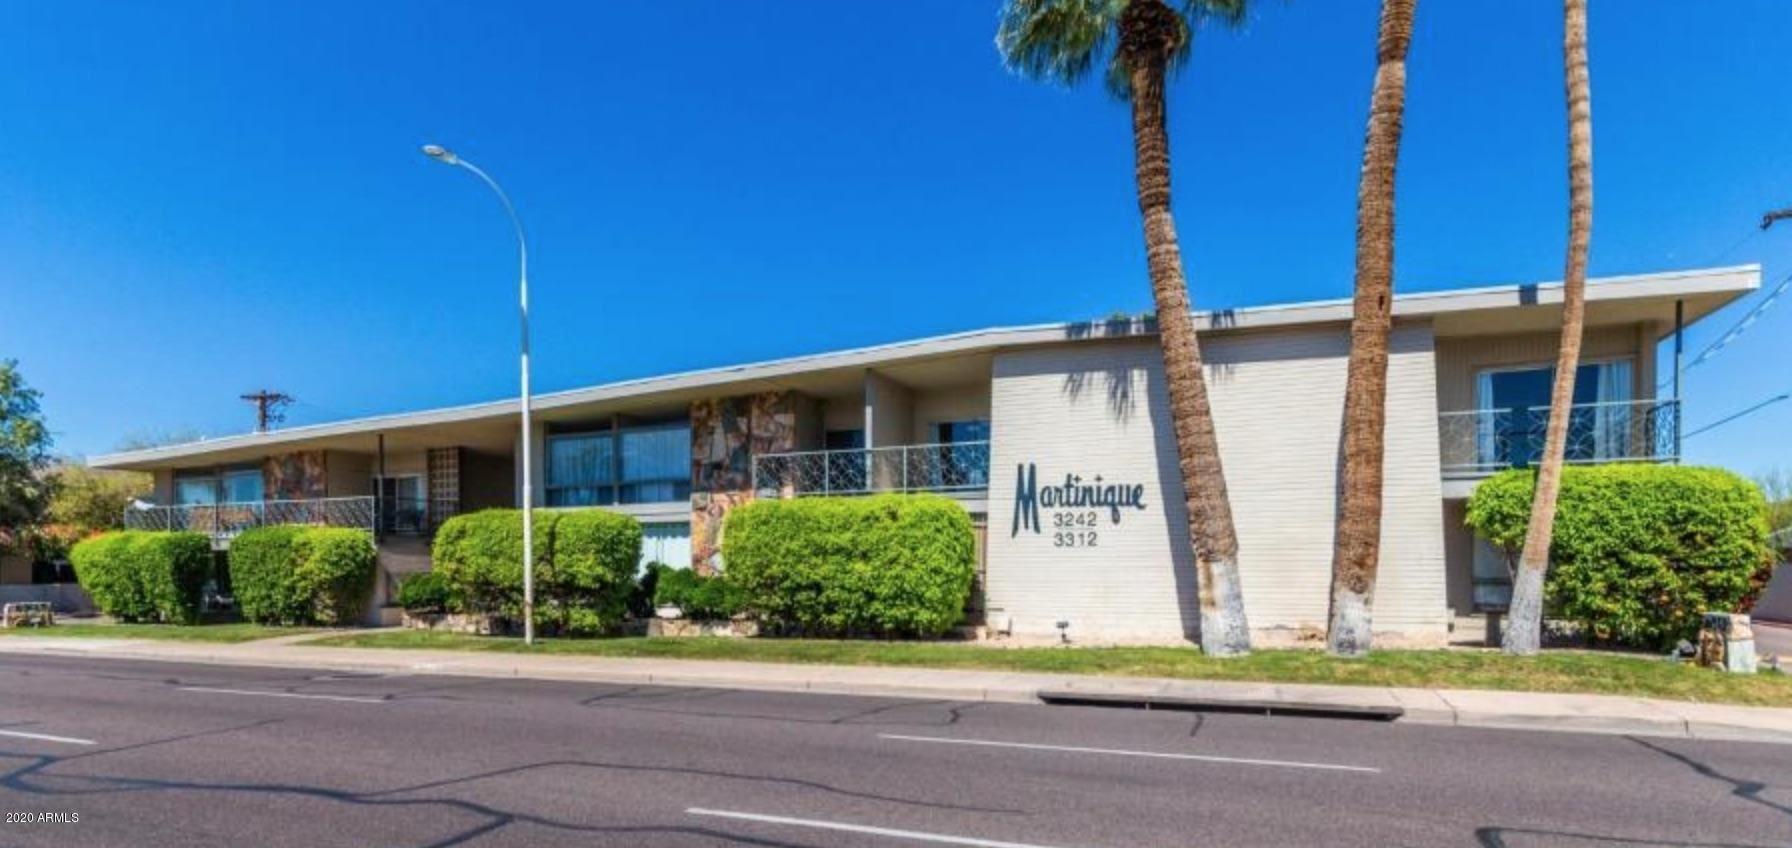 3270 E CAMELBACK Road #210, Phoenix, AZ 85018 - MLS#: 6052194